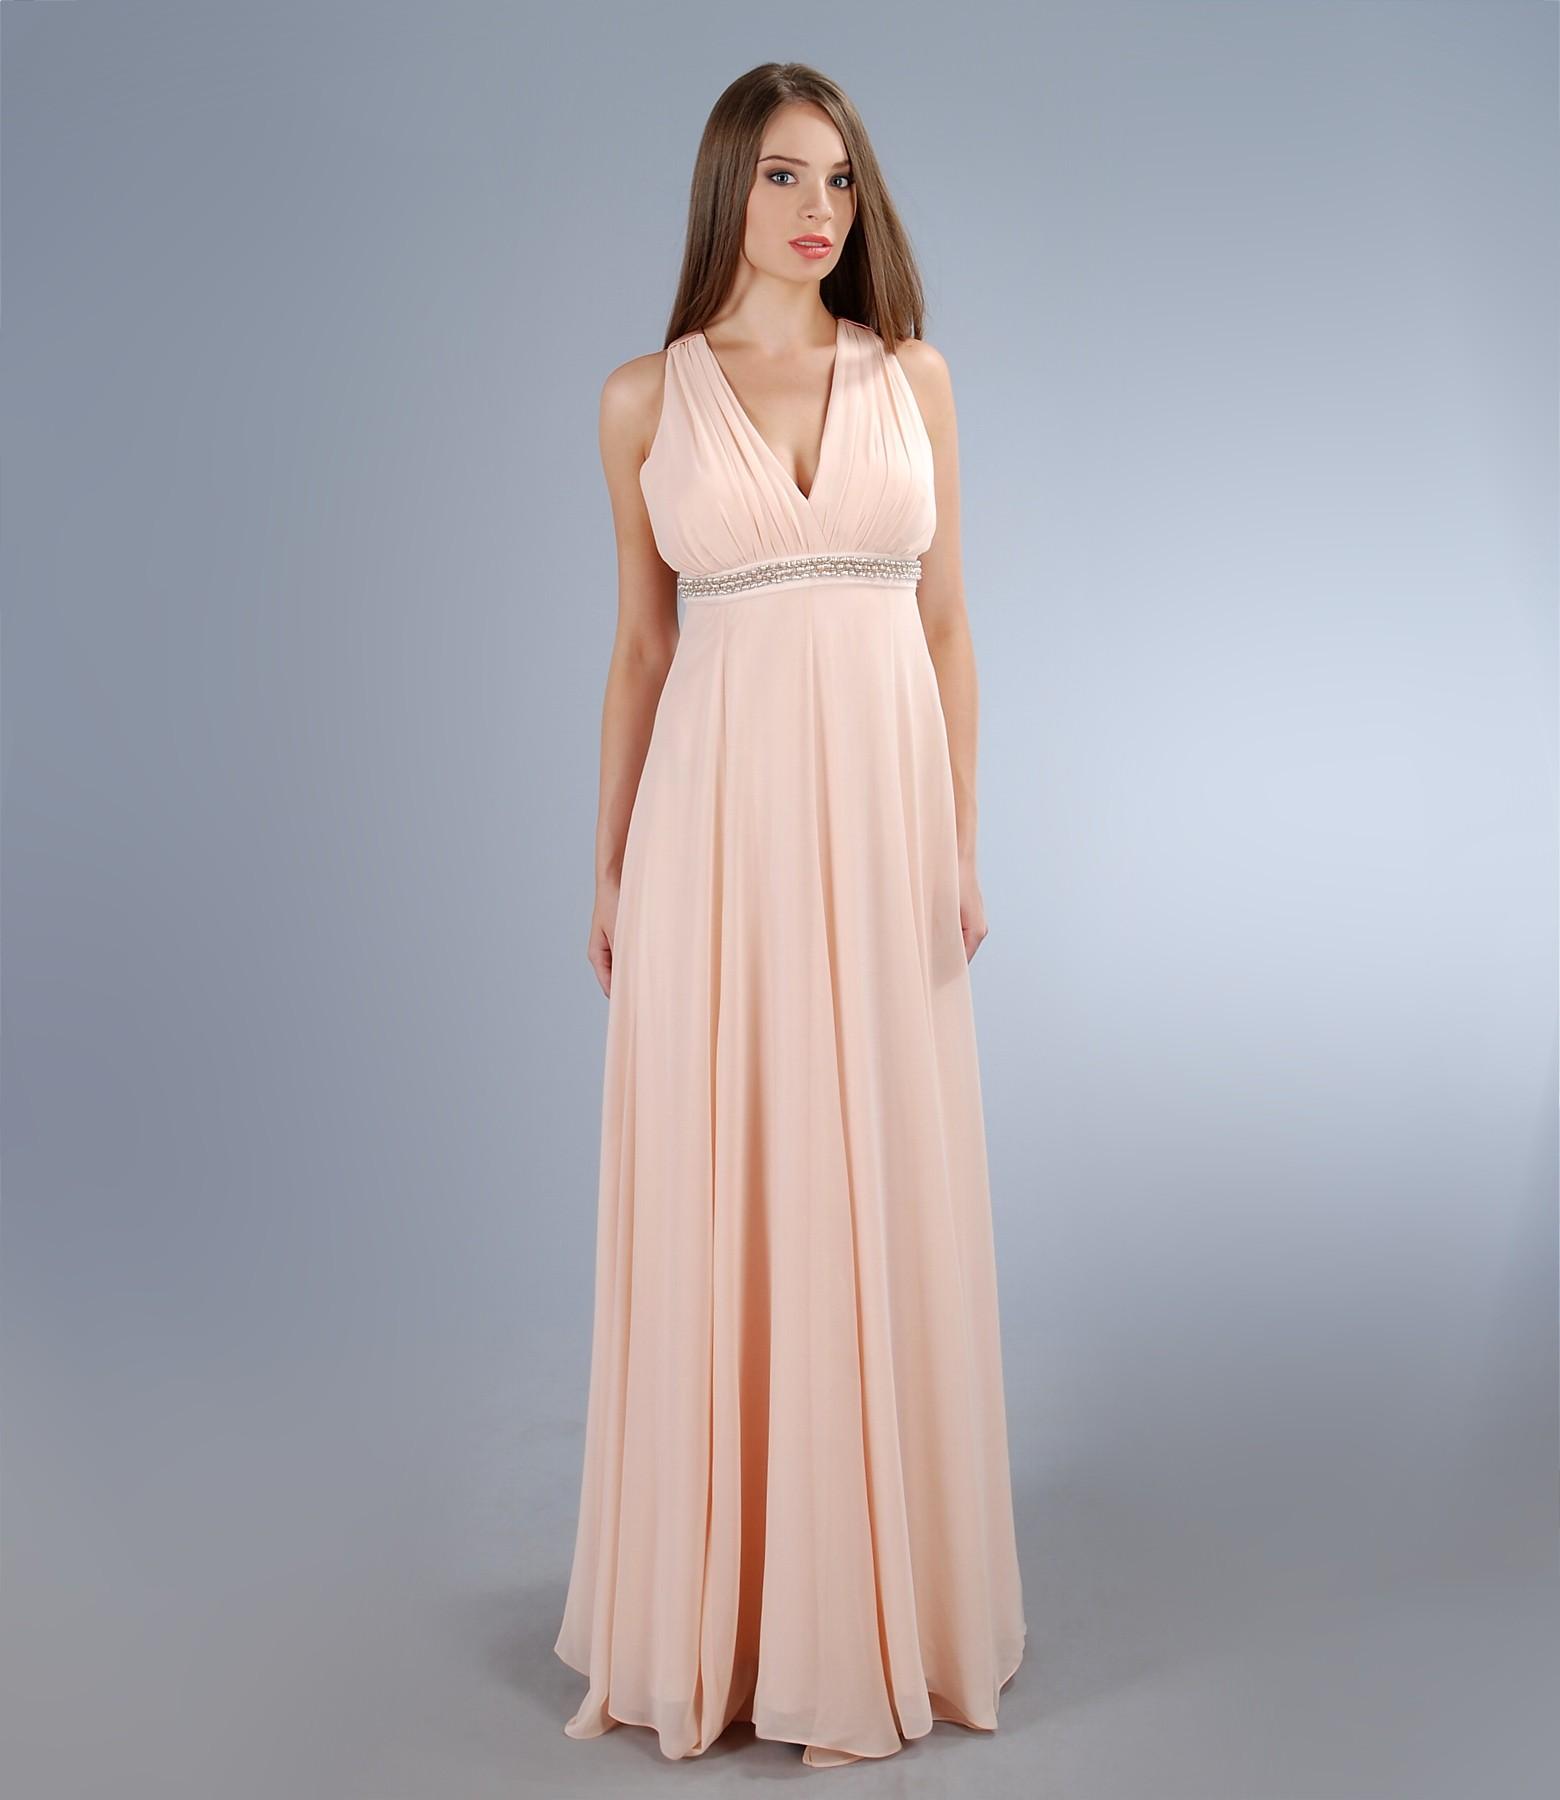 Rochii Elegante Lungi Din Voal